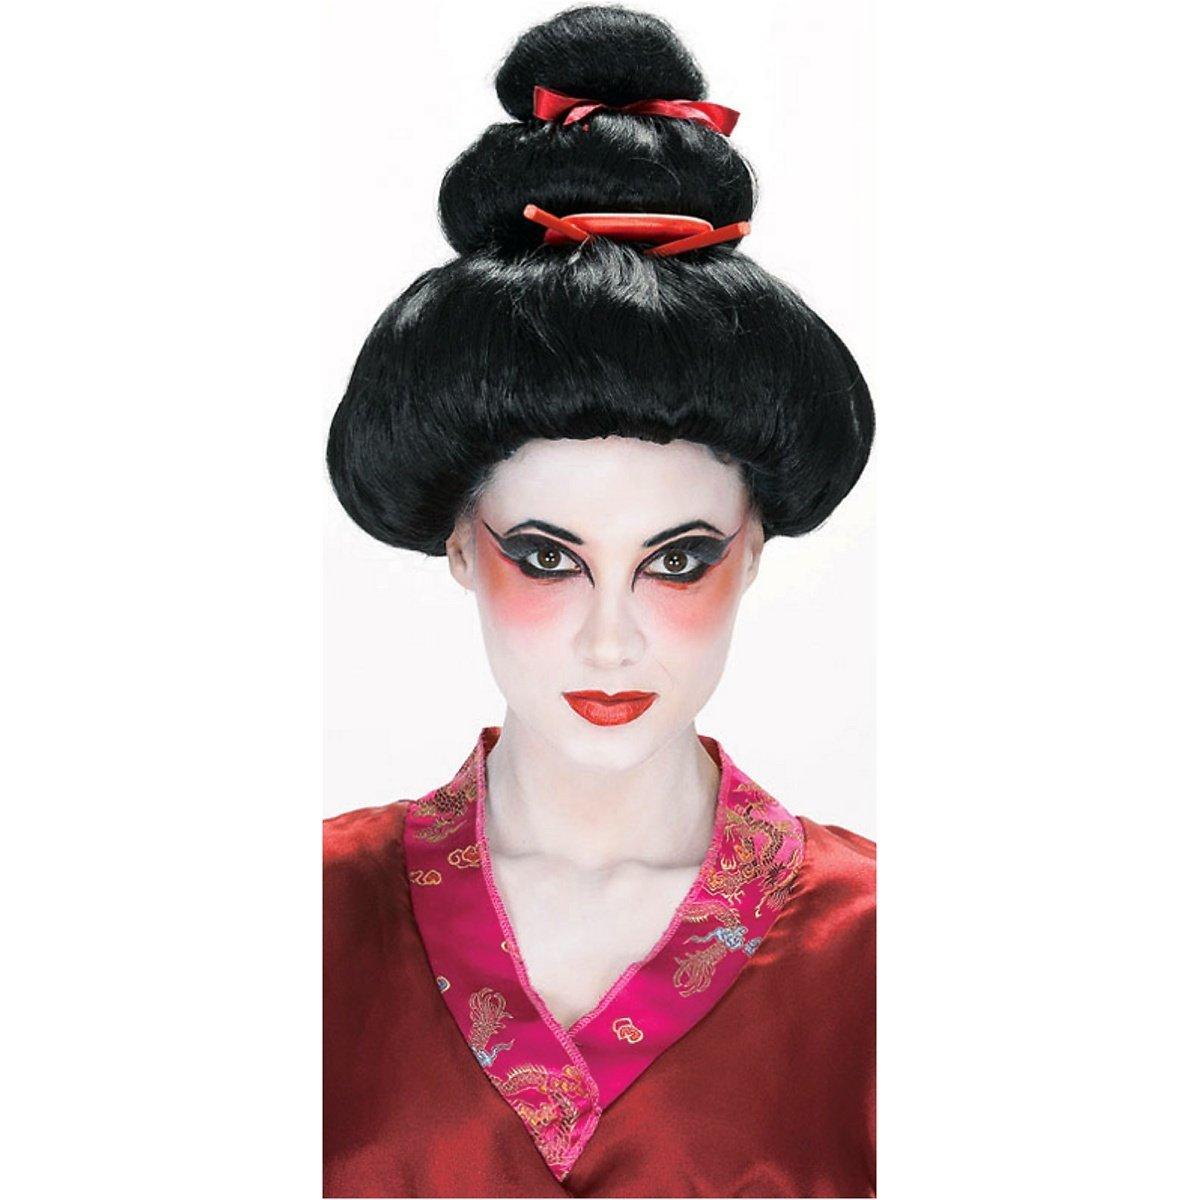 Geisha Wig Costume Accessory